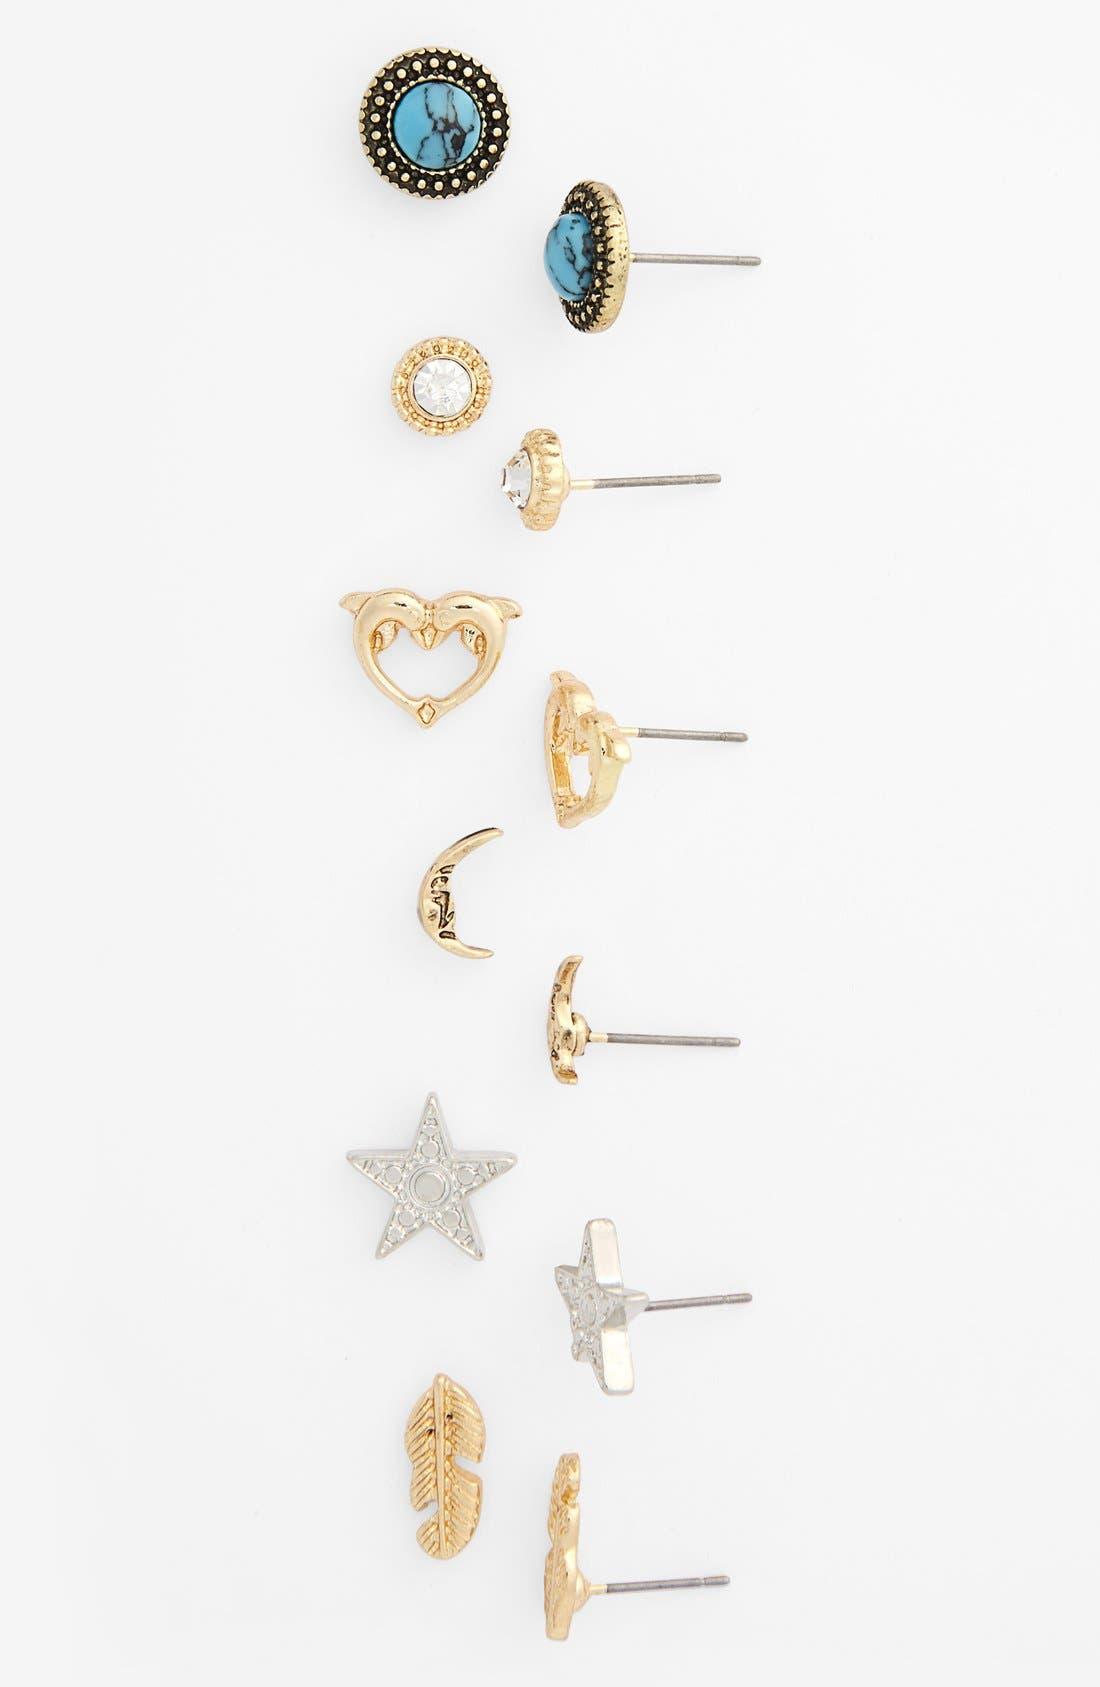 Main Image - Topshop Mixed Stud Earrings (Set of 6)